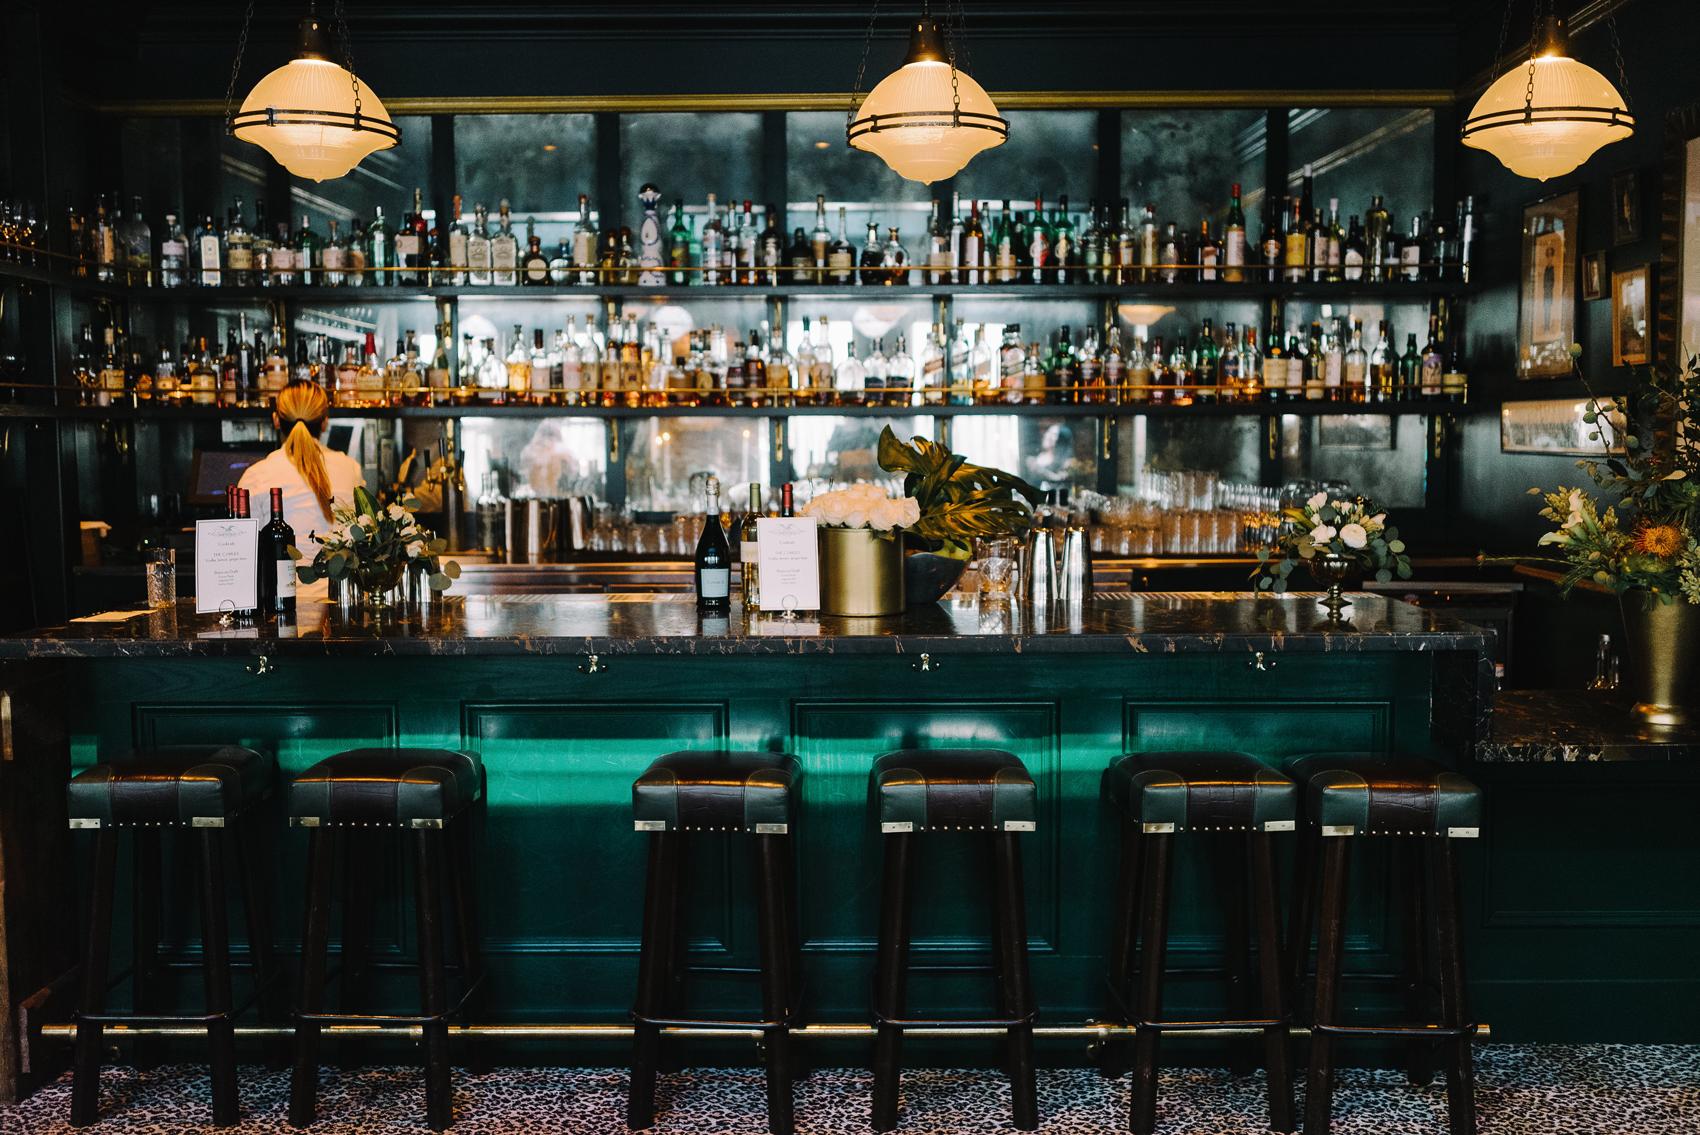 upscale indoor bar